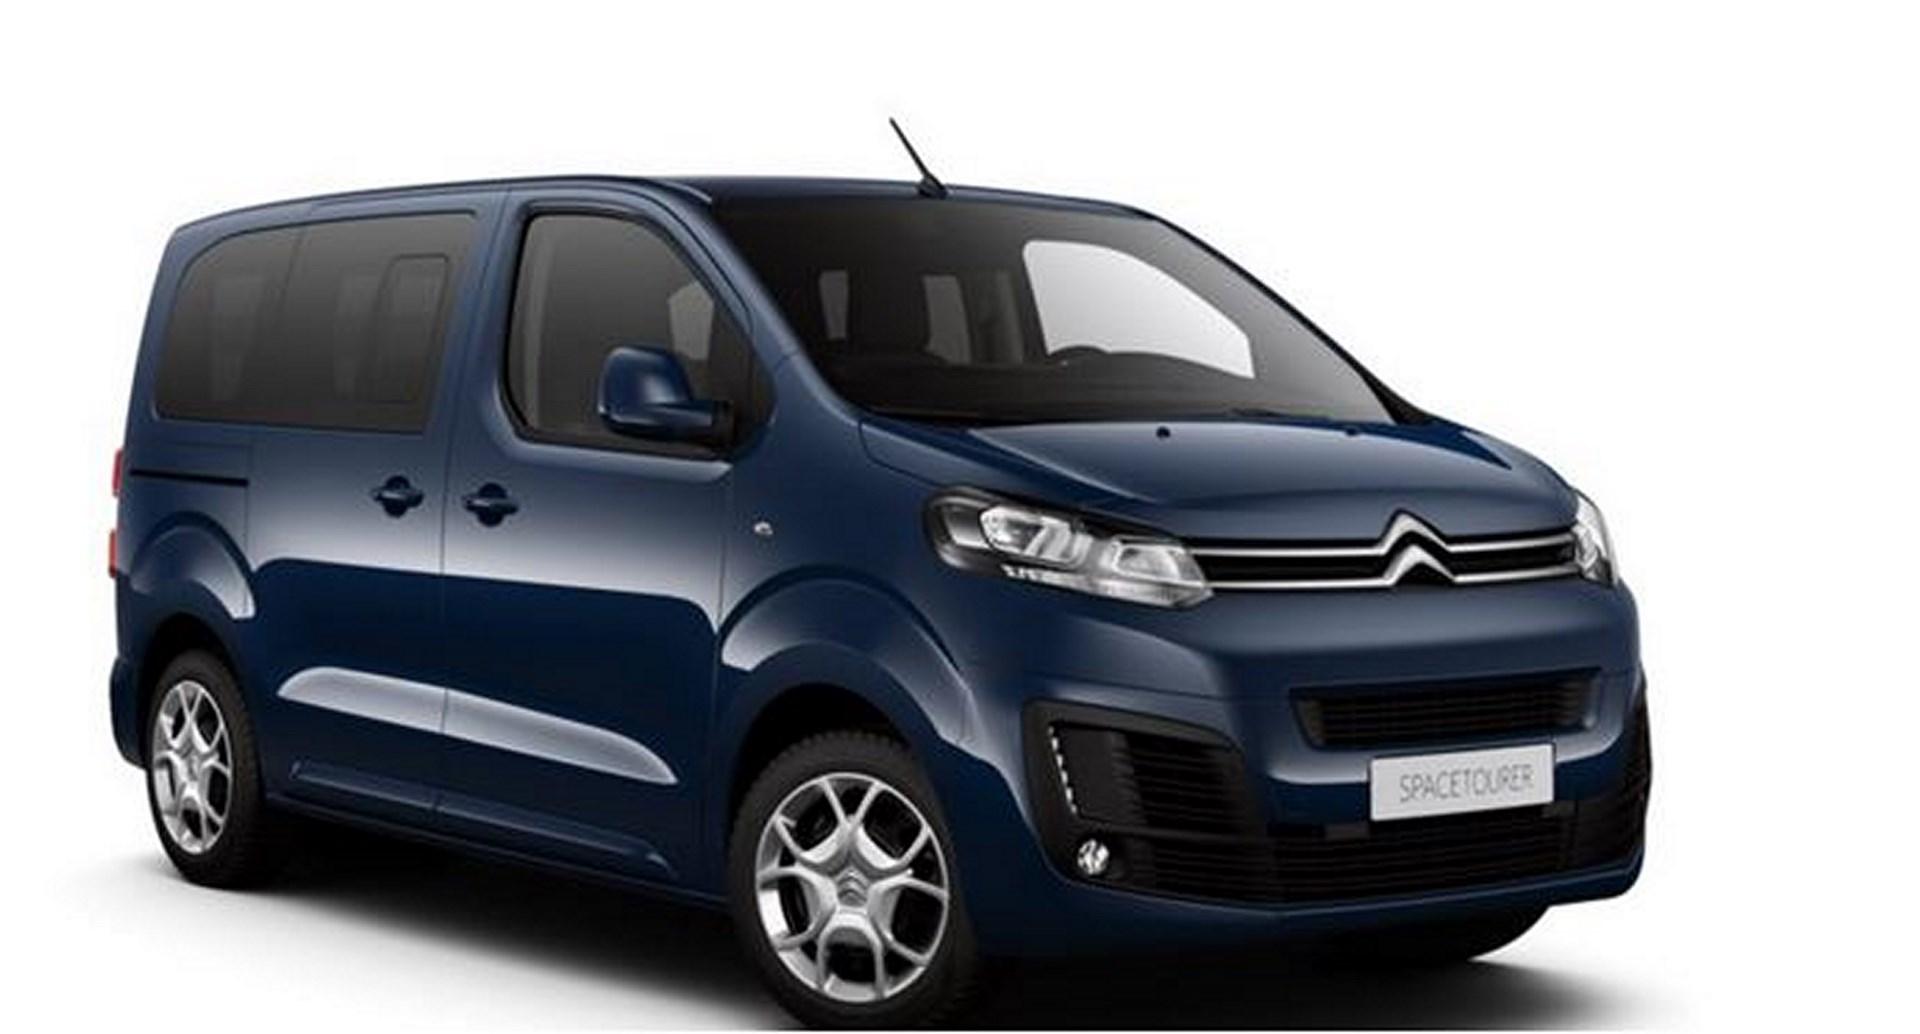 Trevor's new van for 2018